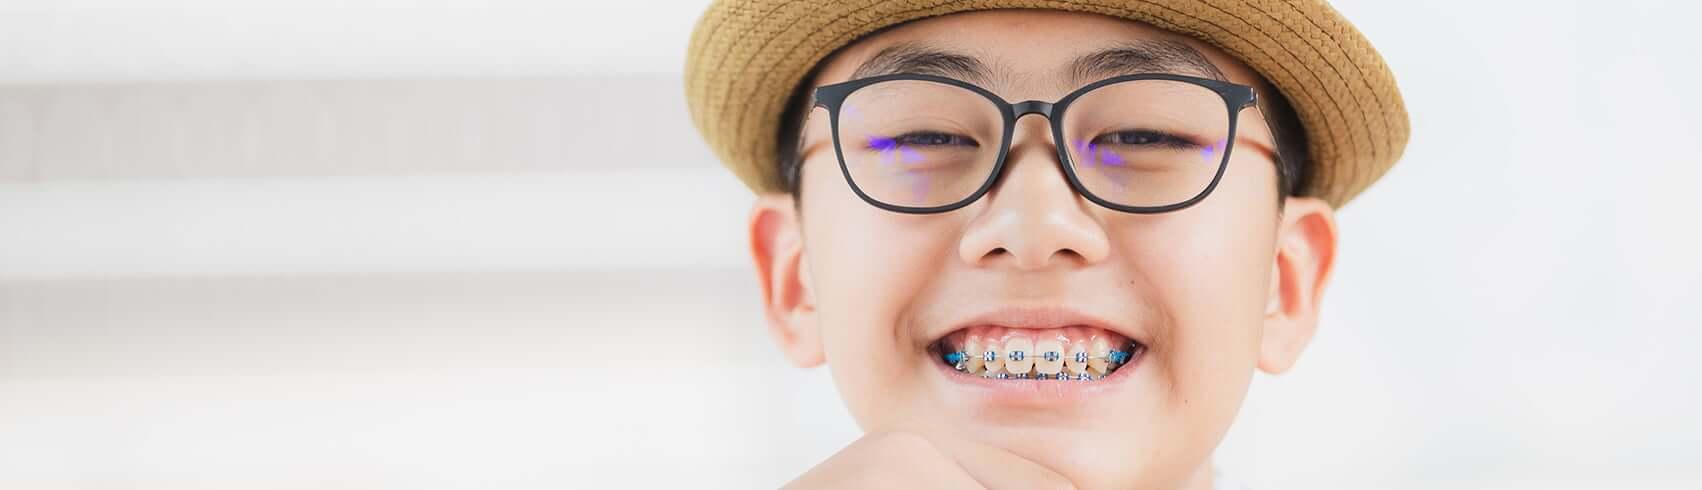 smiling boy wearing braces